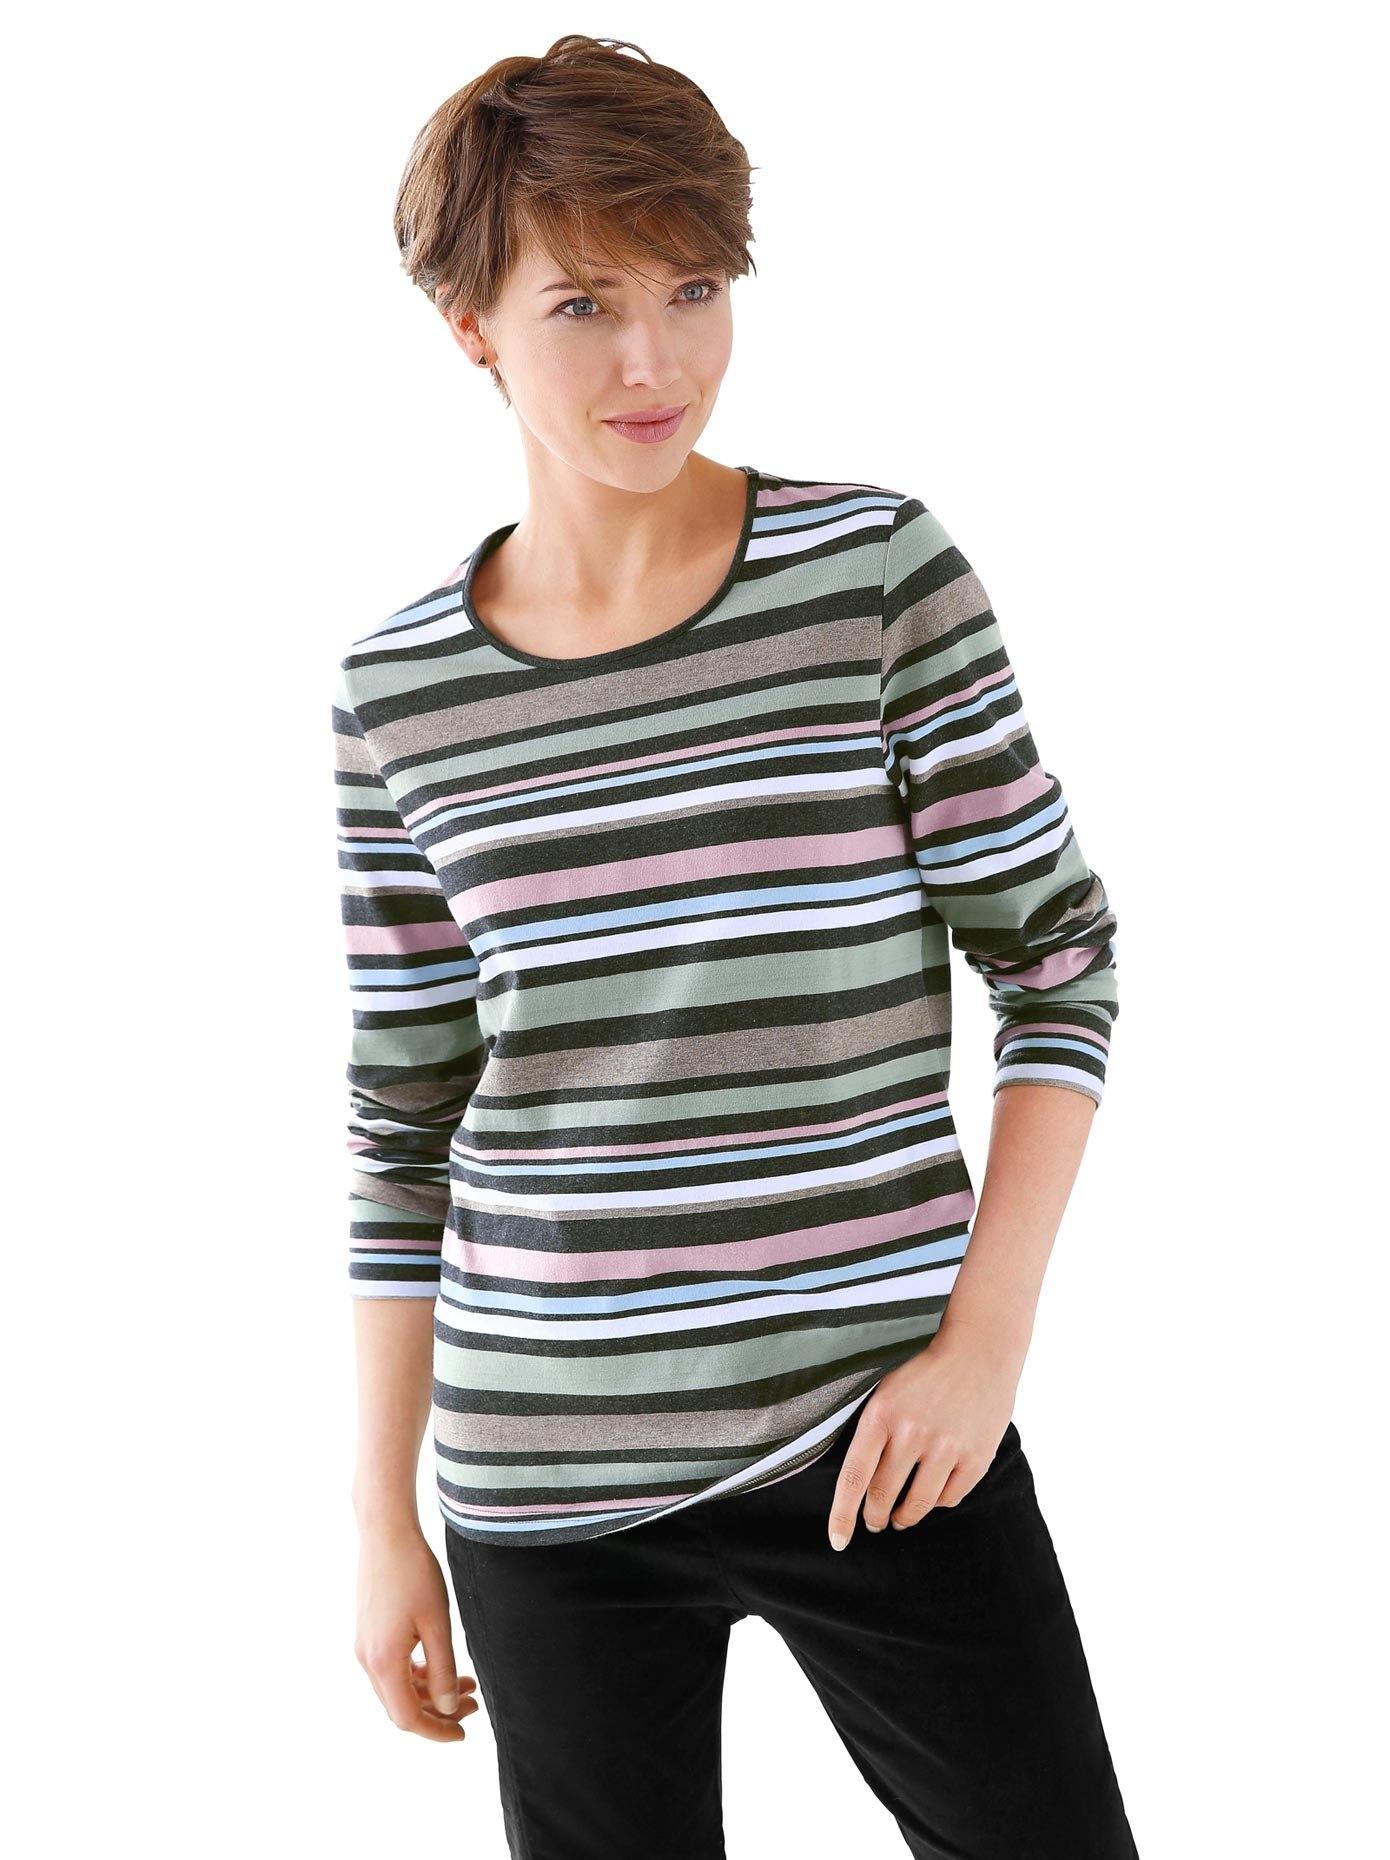 Casual Looks longsleeve voordelig en veilig online kopen